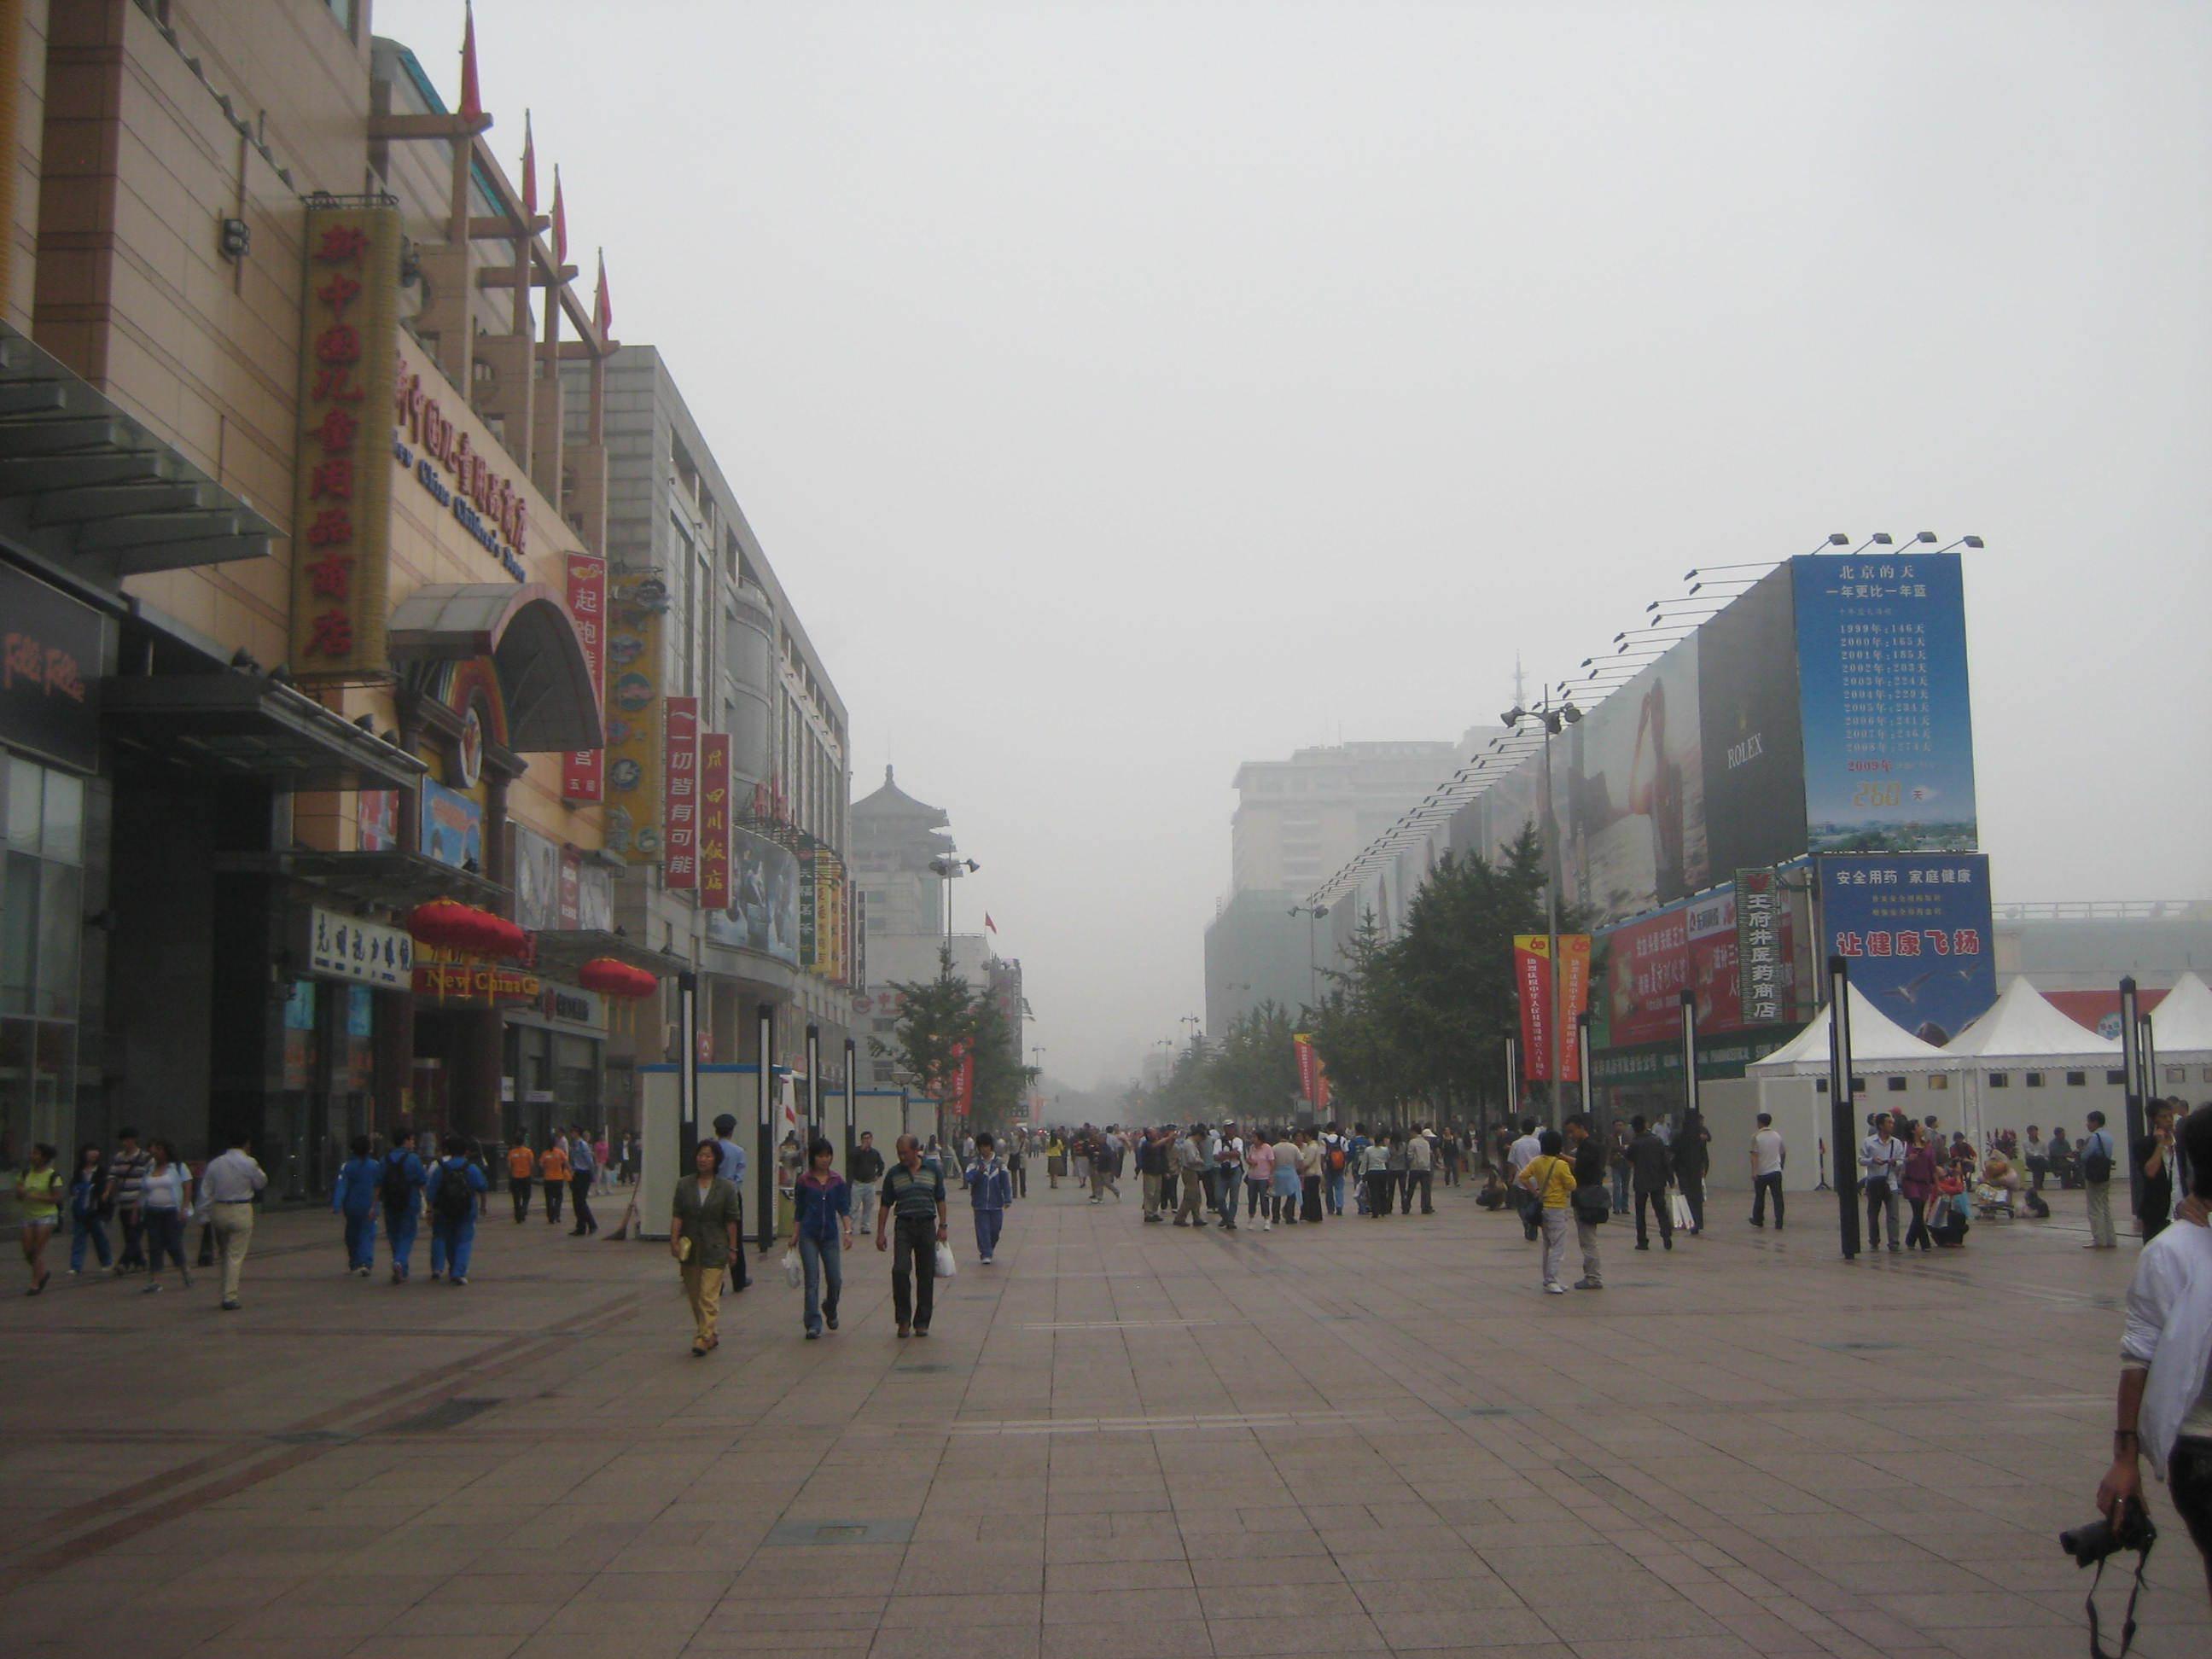 CSIFG2008/wangfujingstpa.JPG